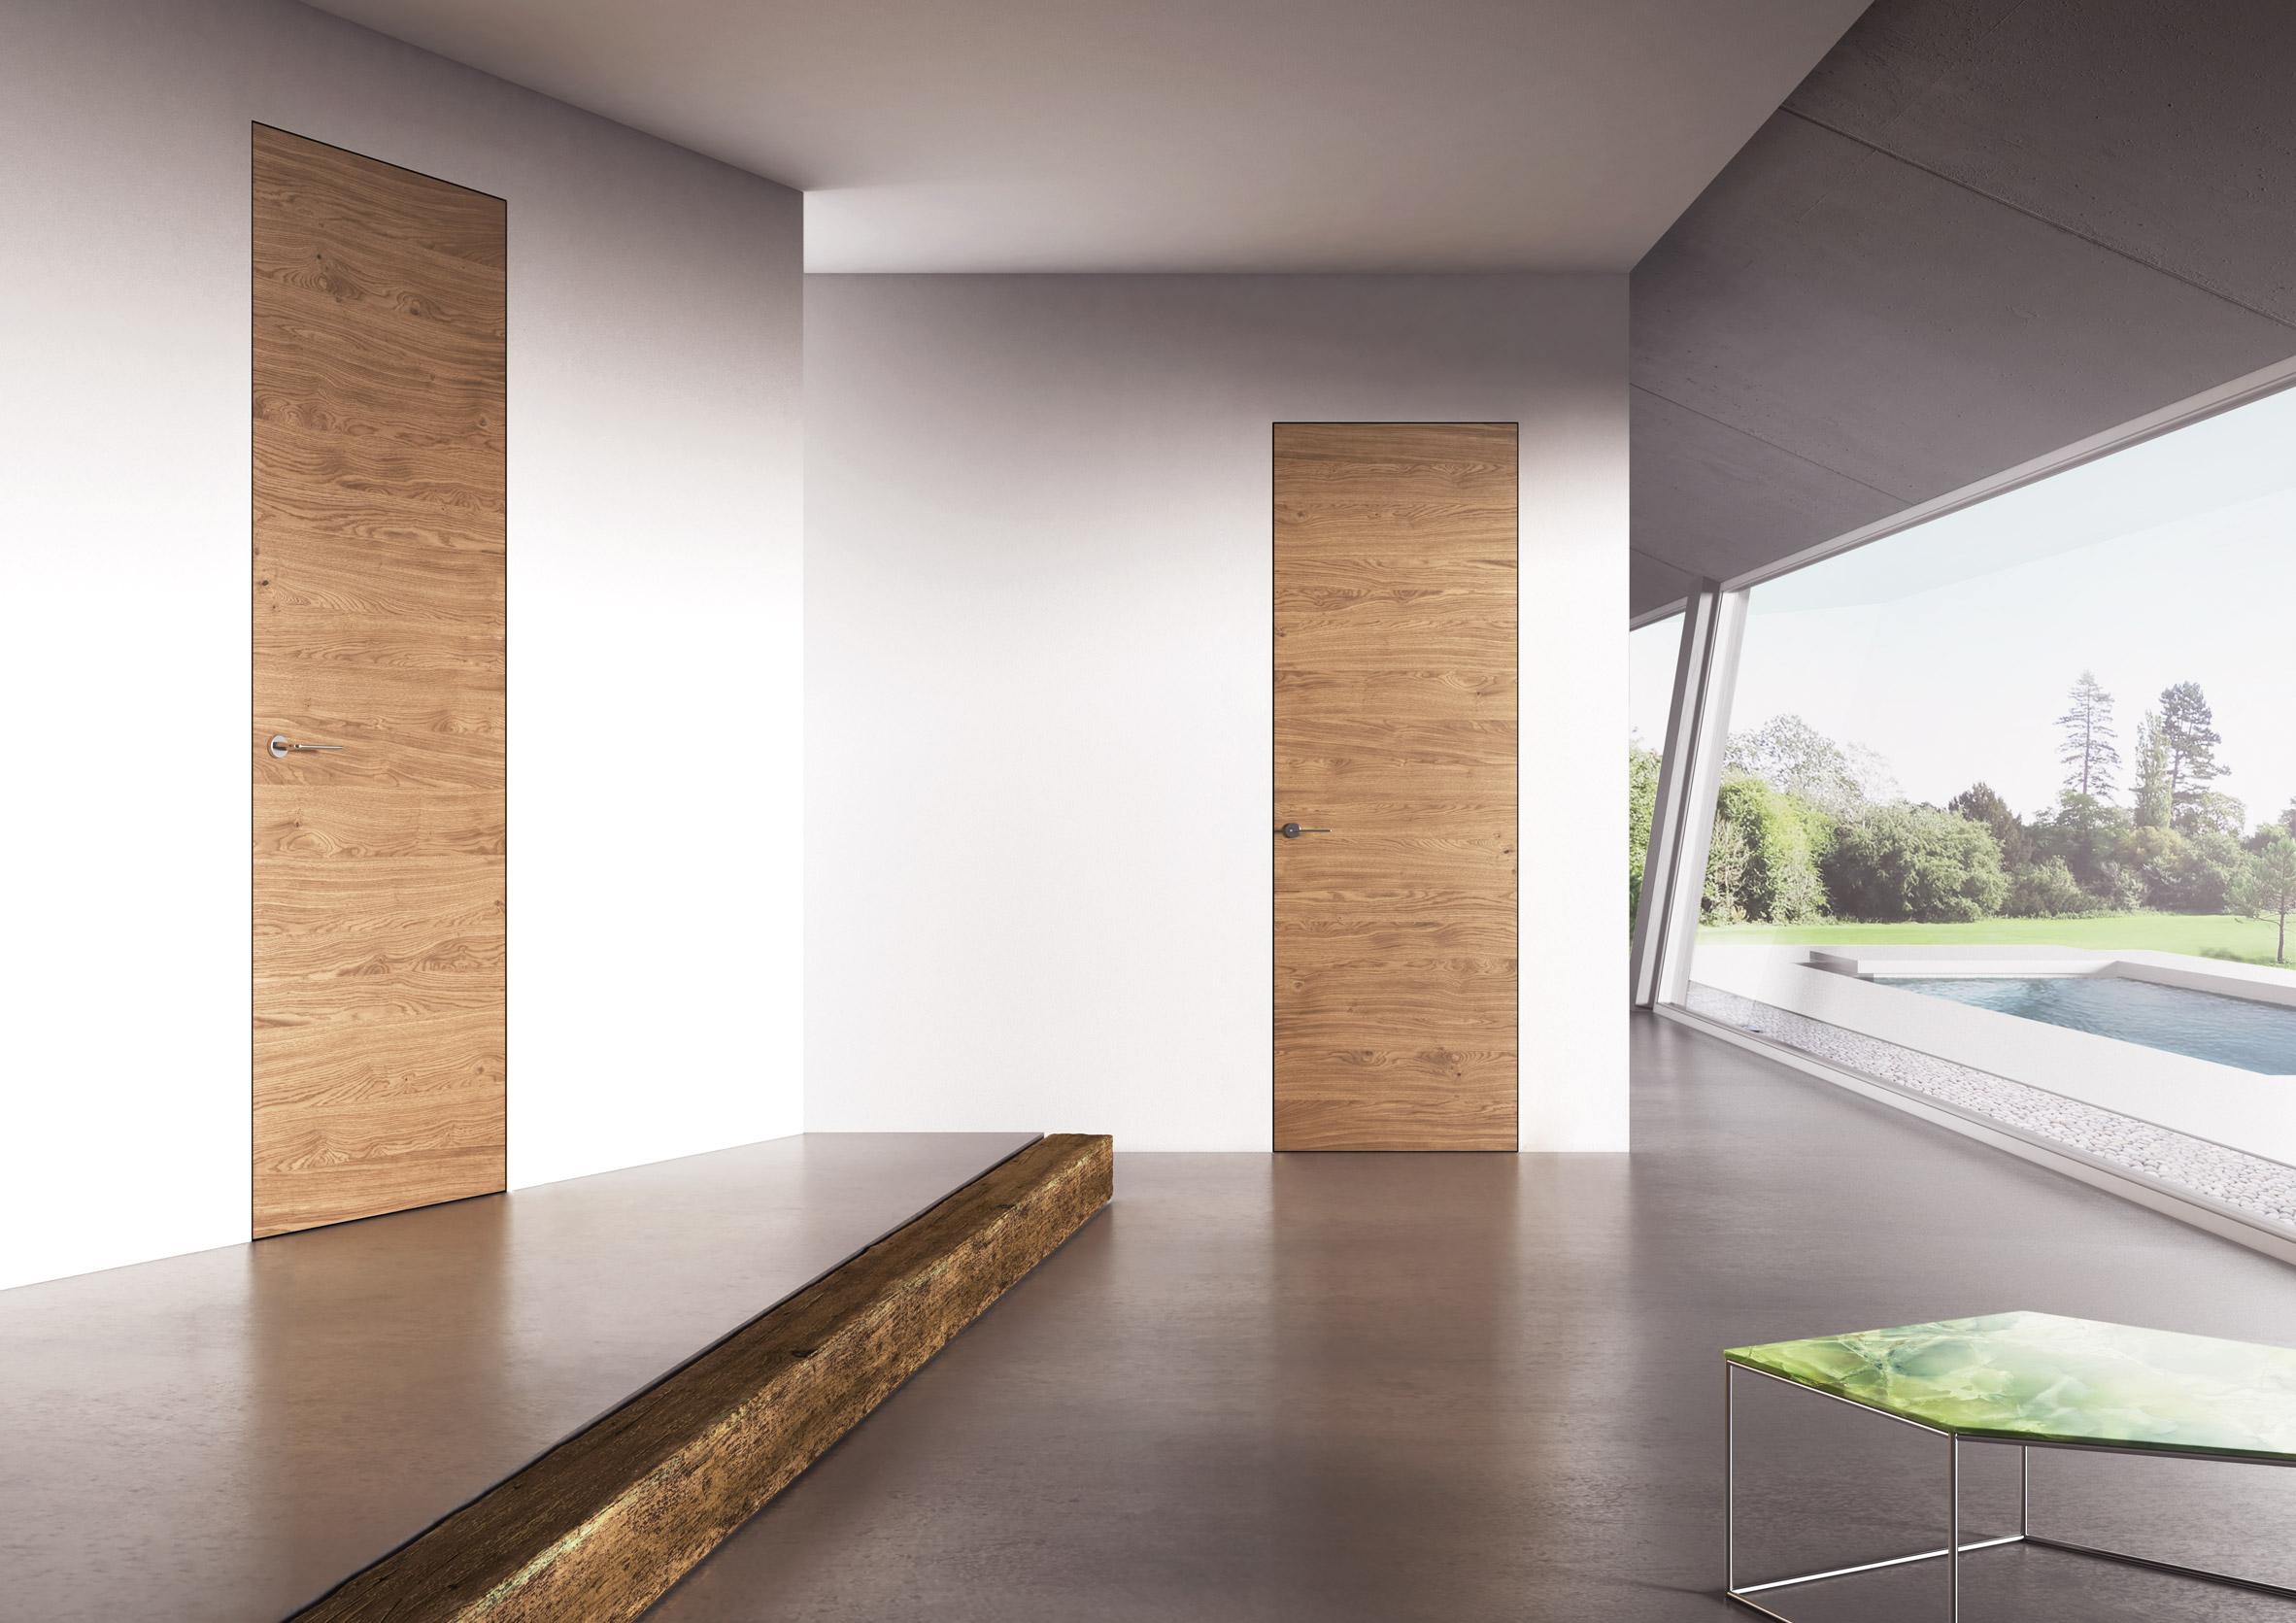 architecture-space-design-studia-interiors-osnovadesign-osnova-poltava_05